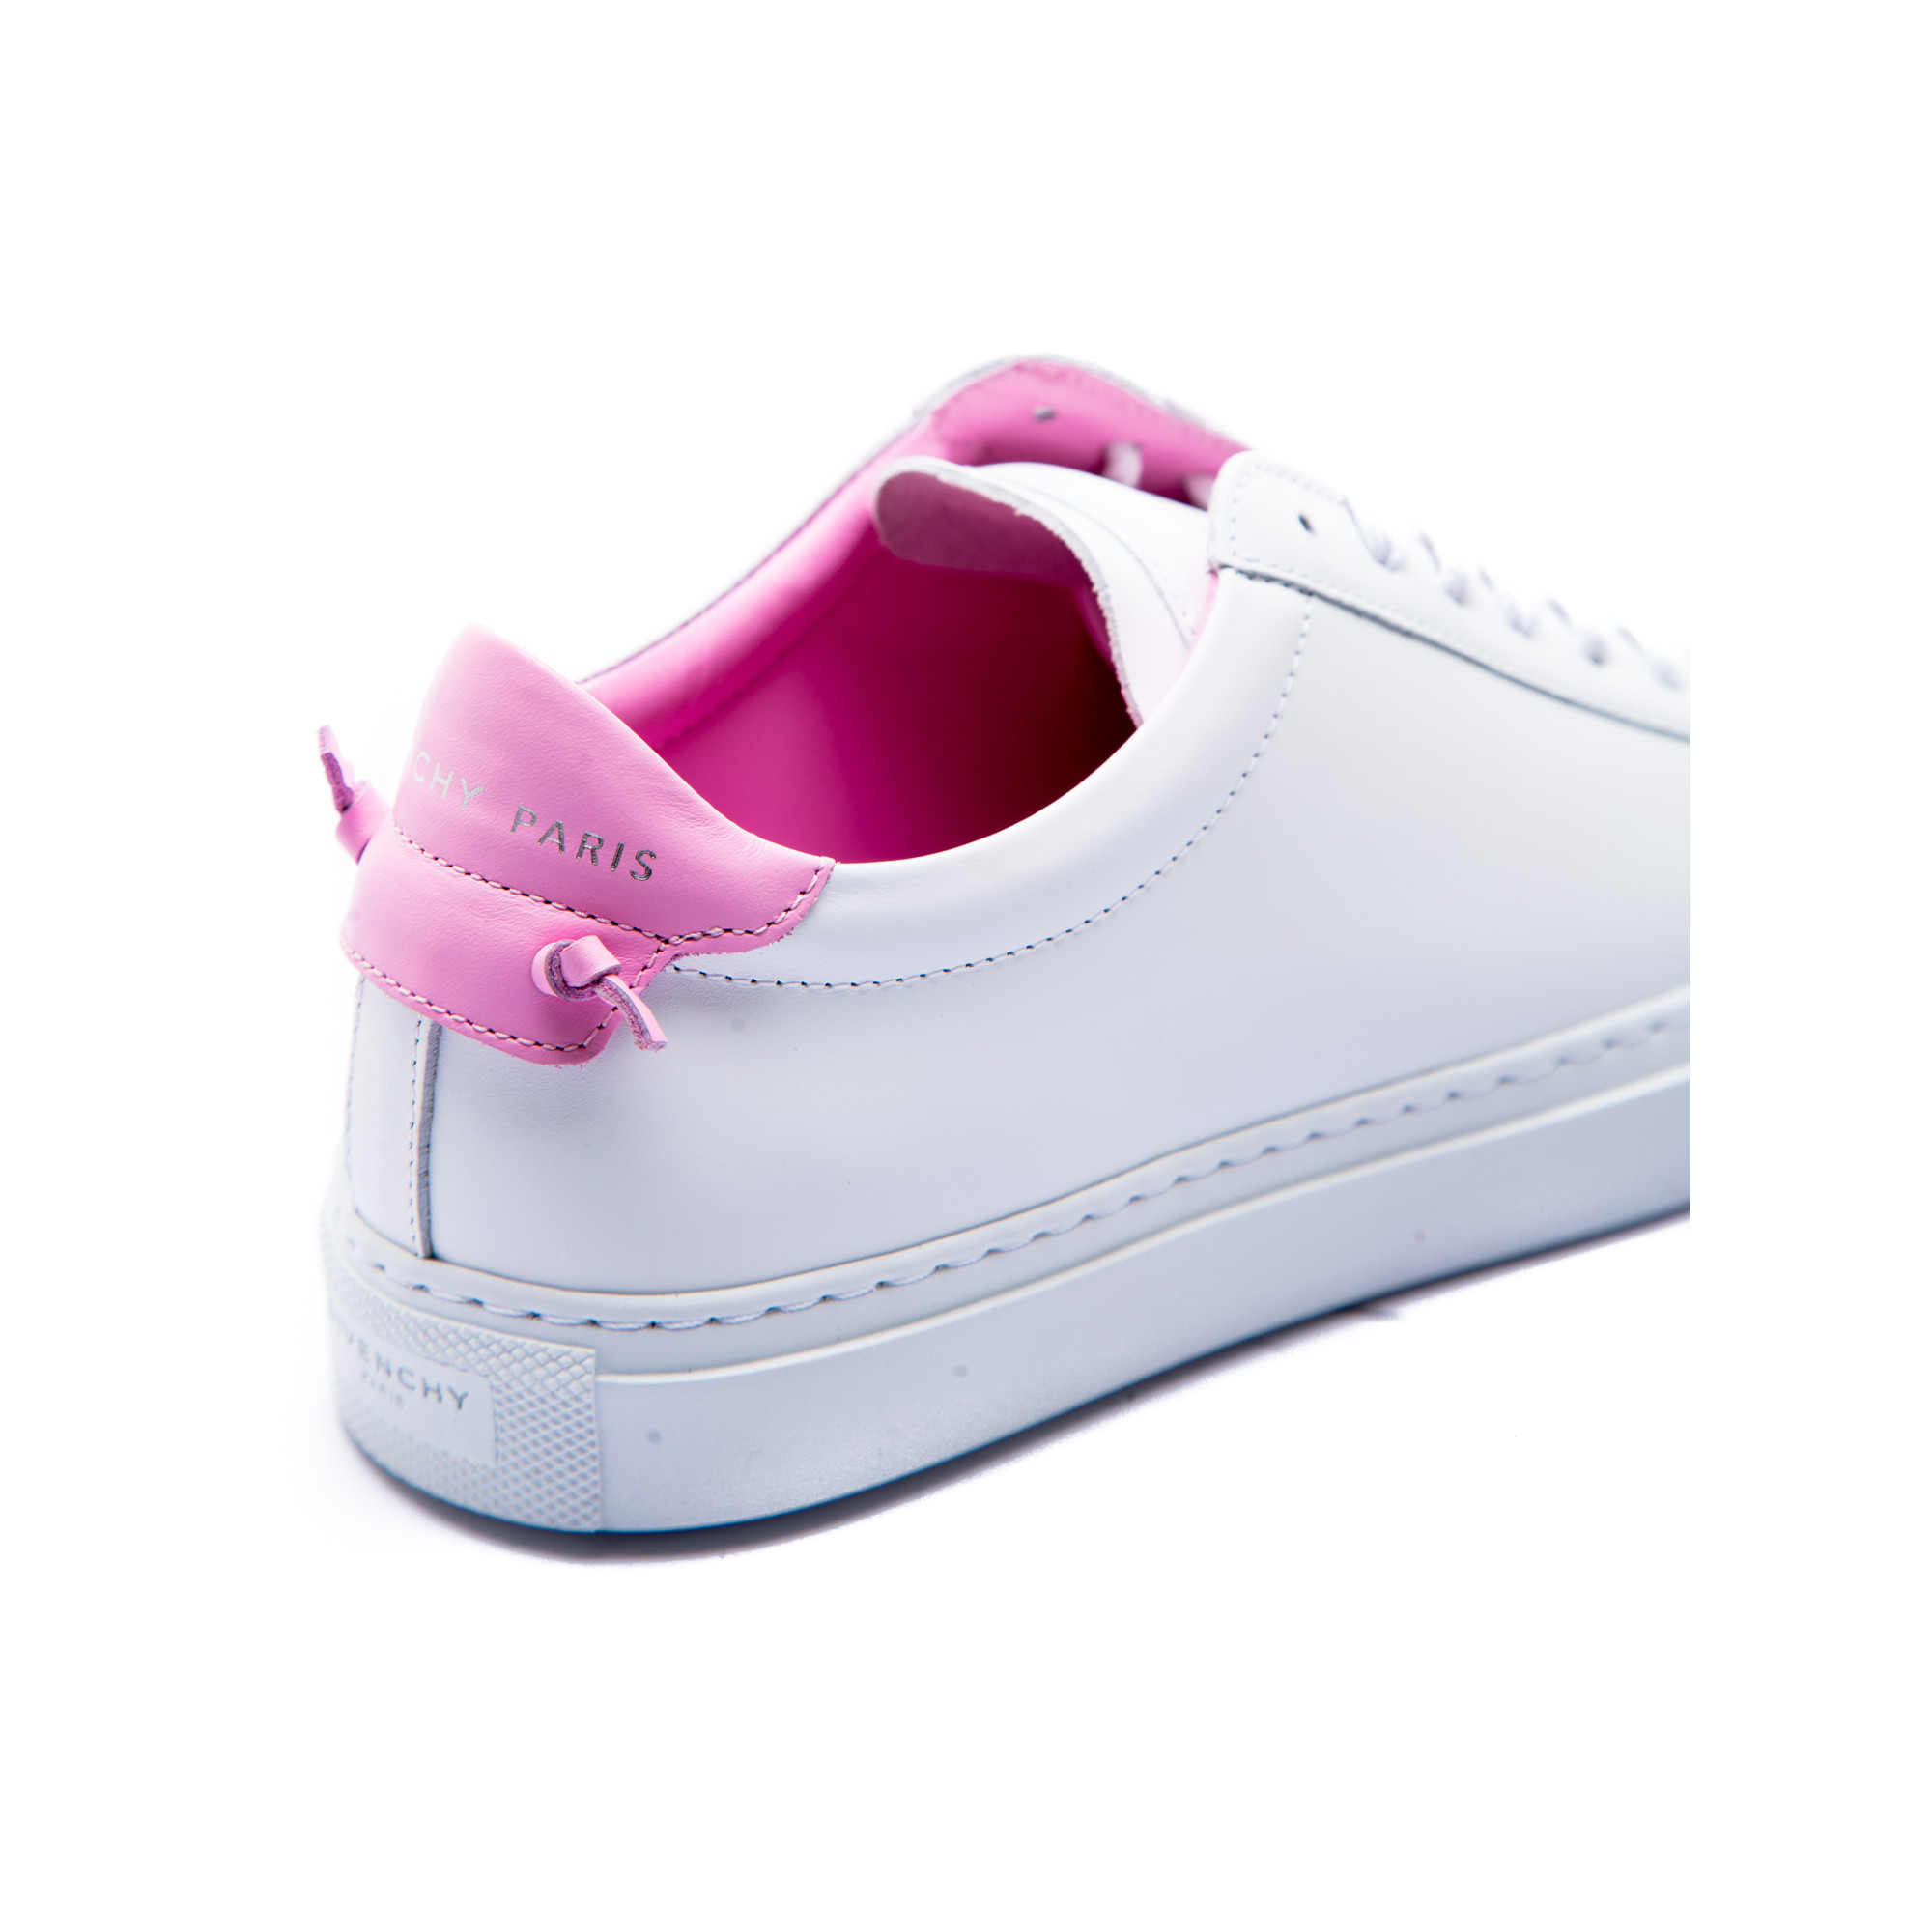 Urbain Rose Chaussures Givenchy Pour Les Femmes Urbaines 0I0Sa0